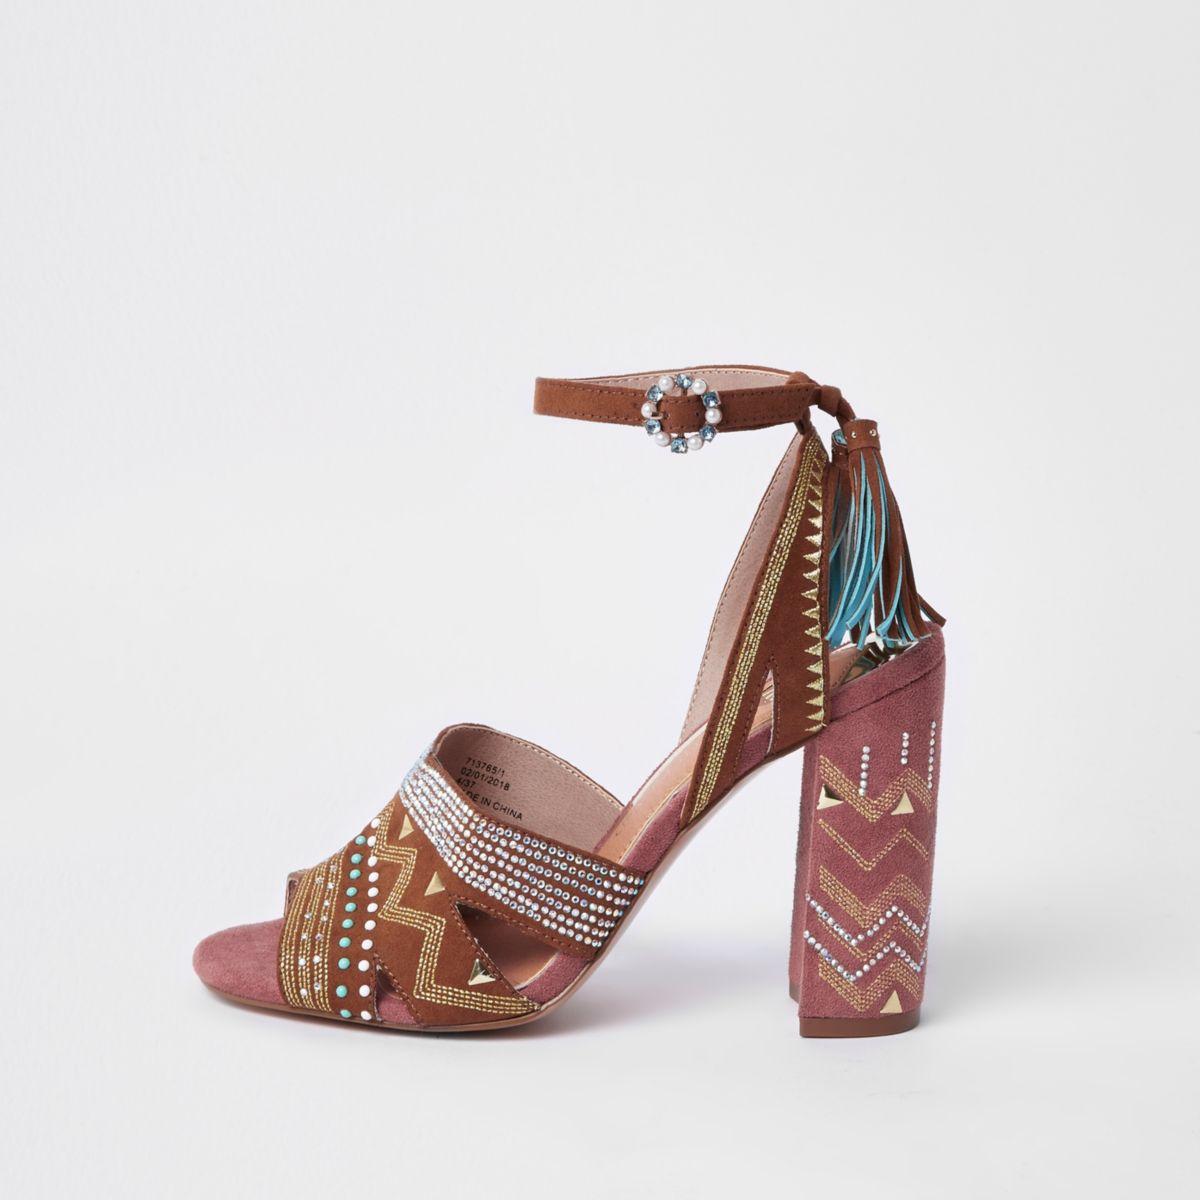 Bruine sandalen met aztekenprint en blokhak